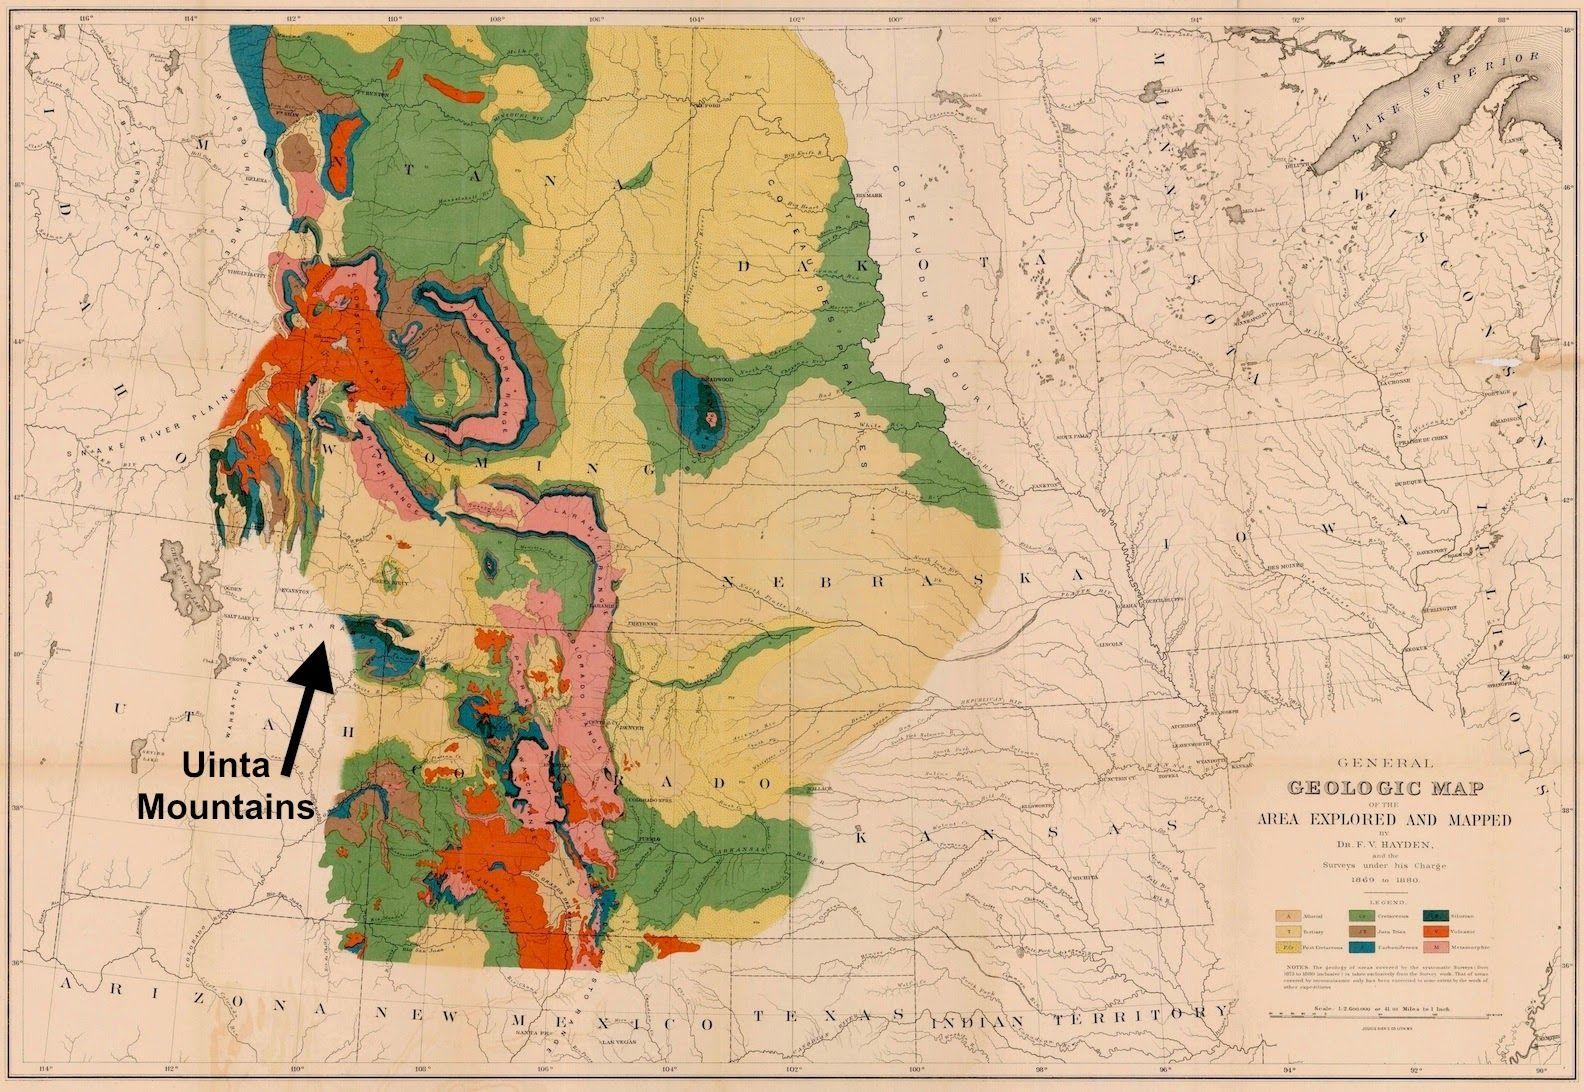 Uinta Mountains (southwest Wyoming and northeast Utah) on ...